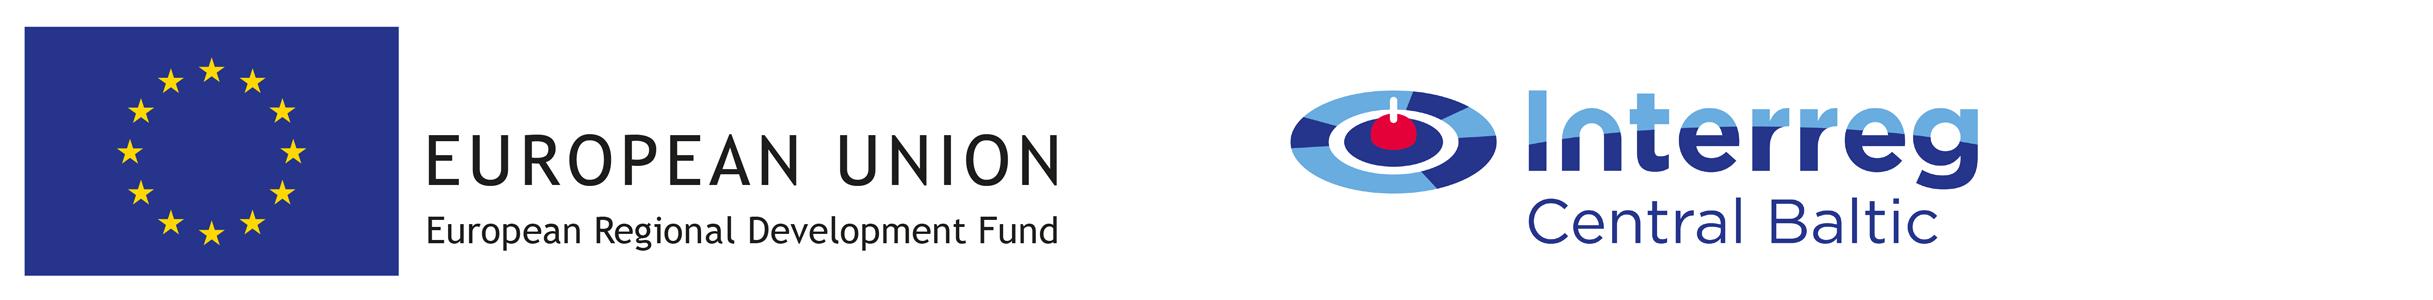 EU-and-central-baltic-logo